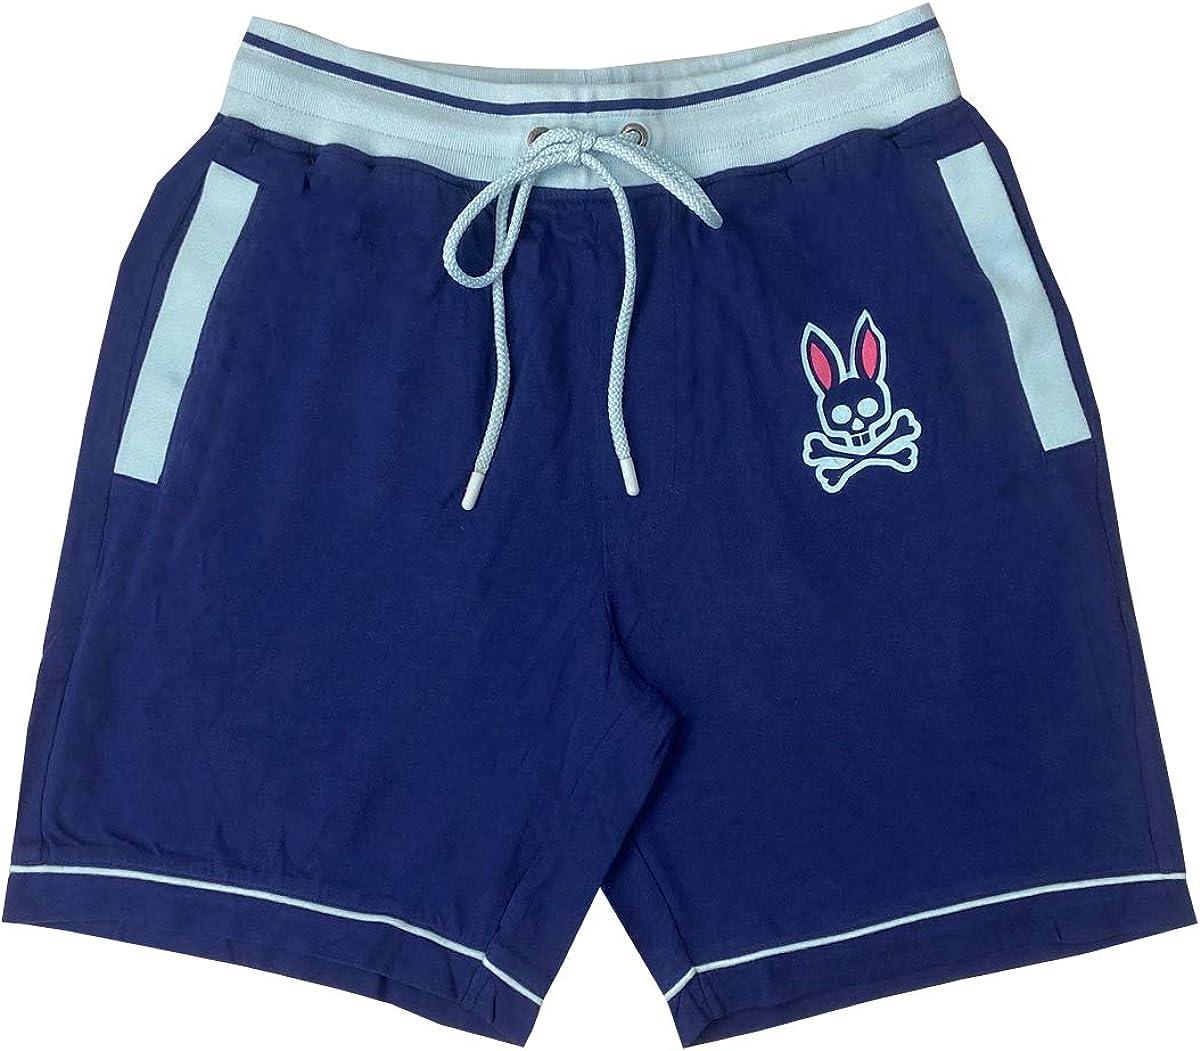 Psycho Bunny Men's Colorblock Sweatpant Lounge Shorts